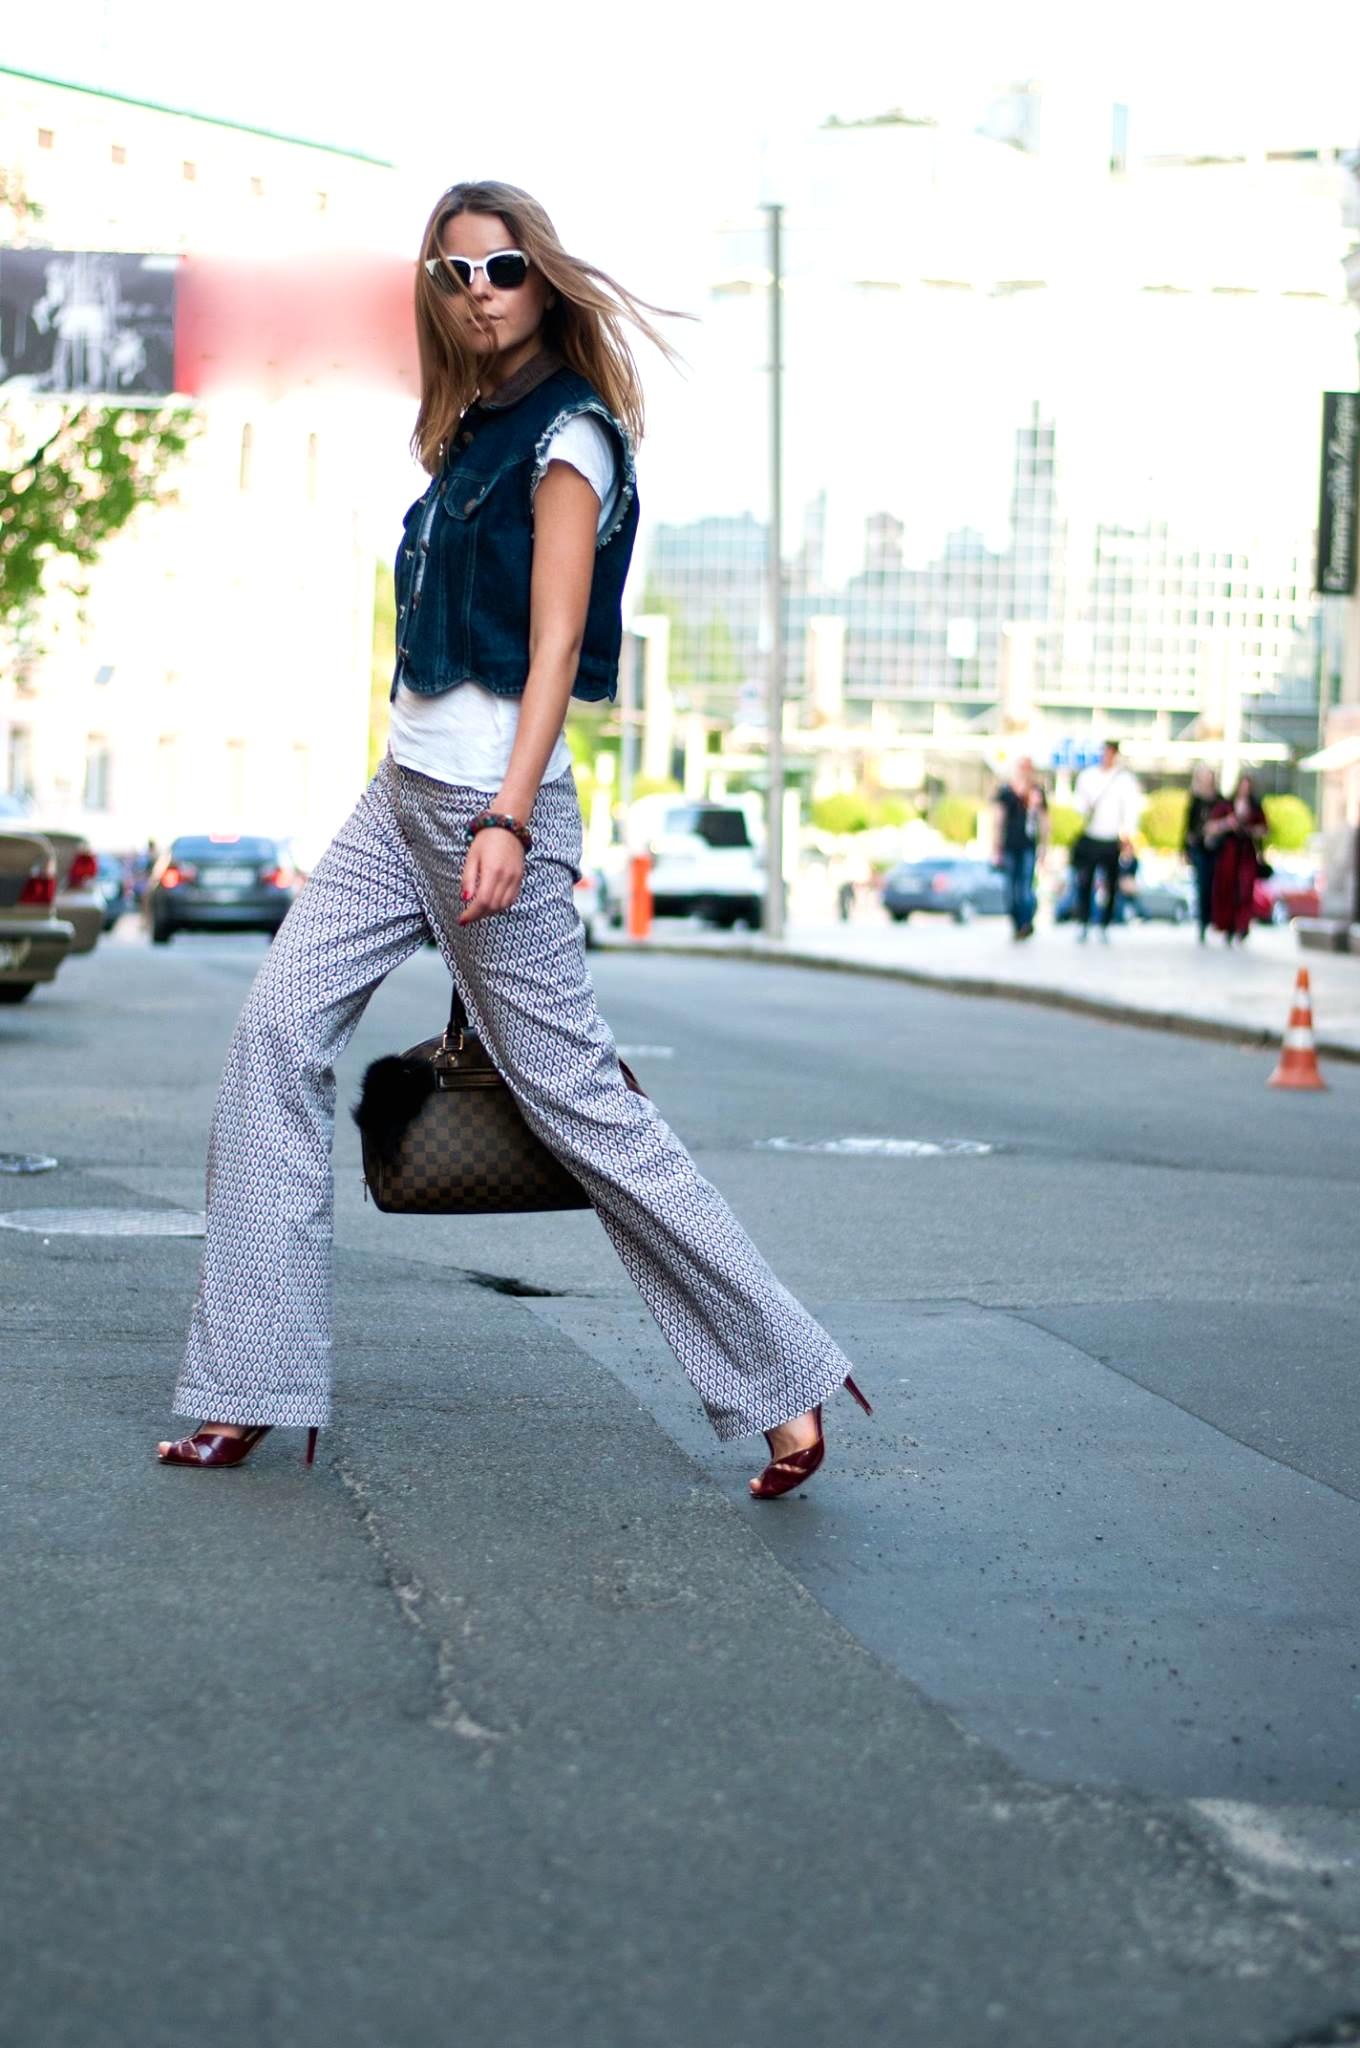 walking in graphic style Svetlana shashkova